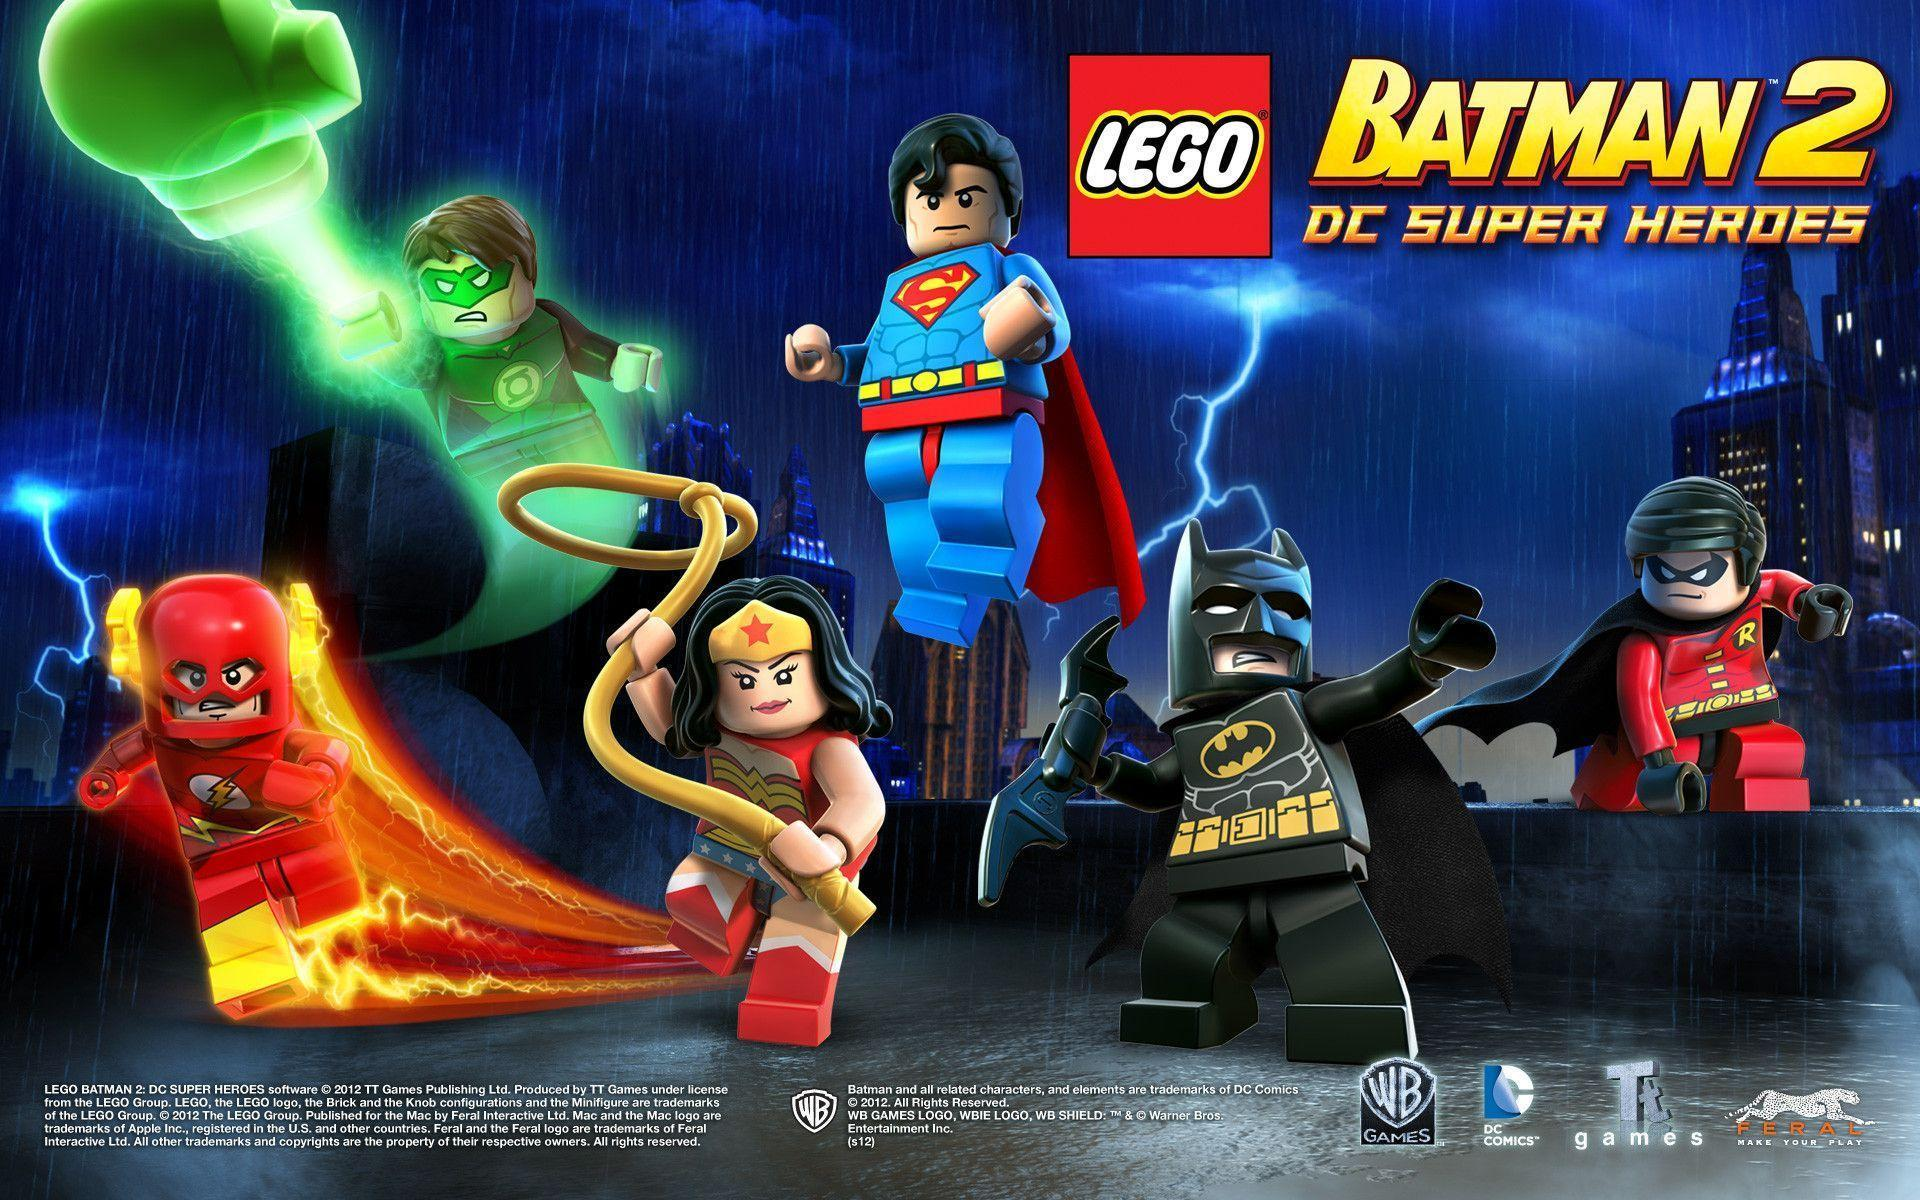 lego batman 2 wallpaper flash - photo #6